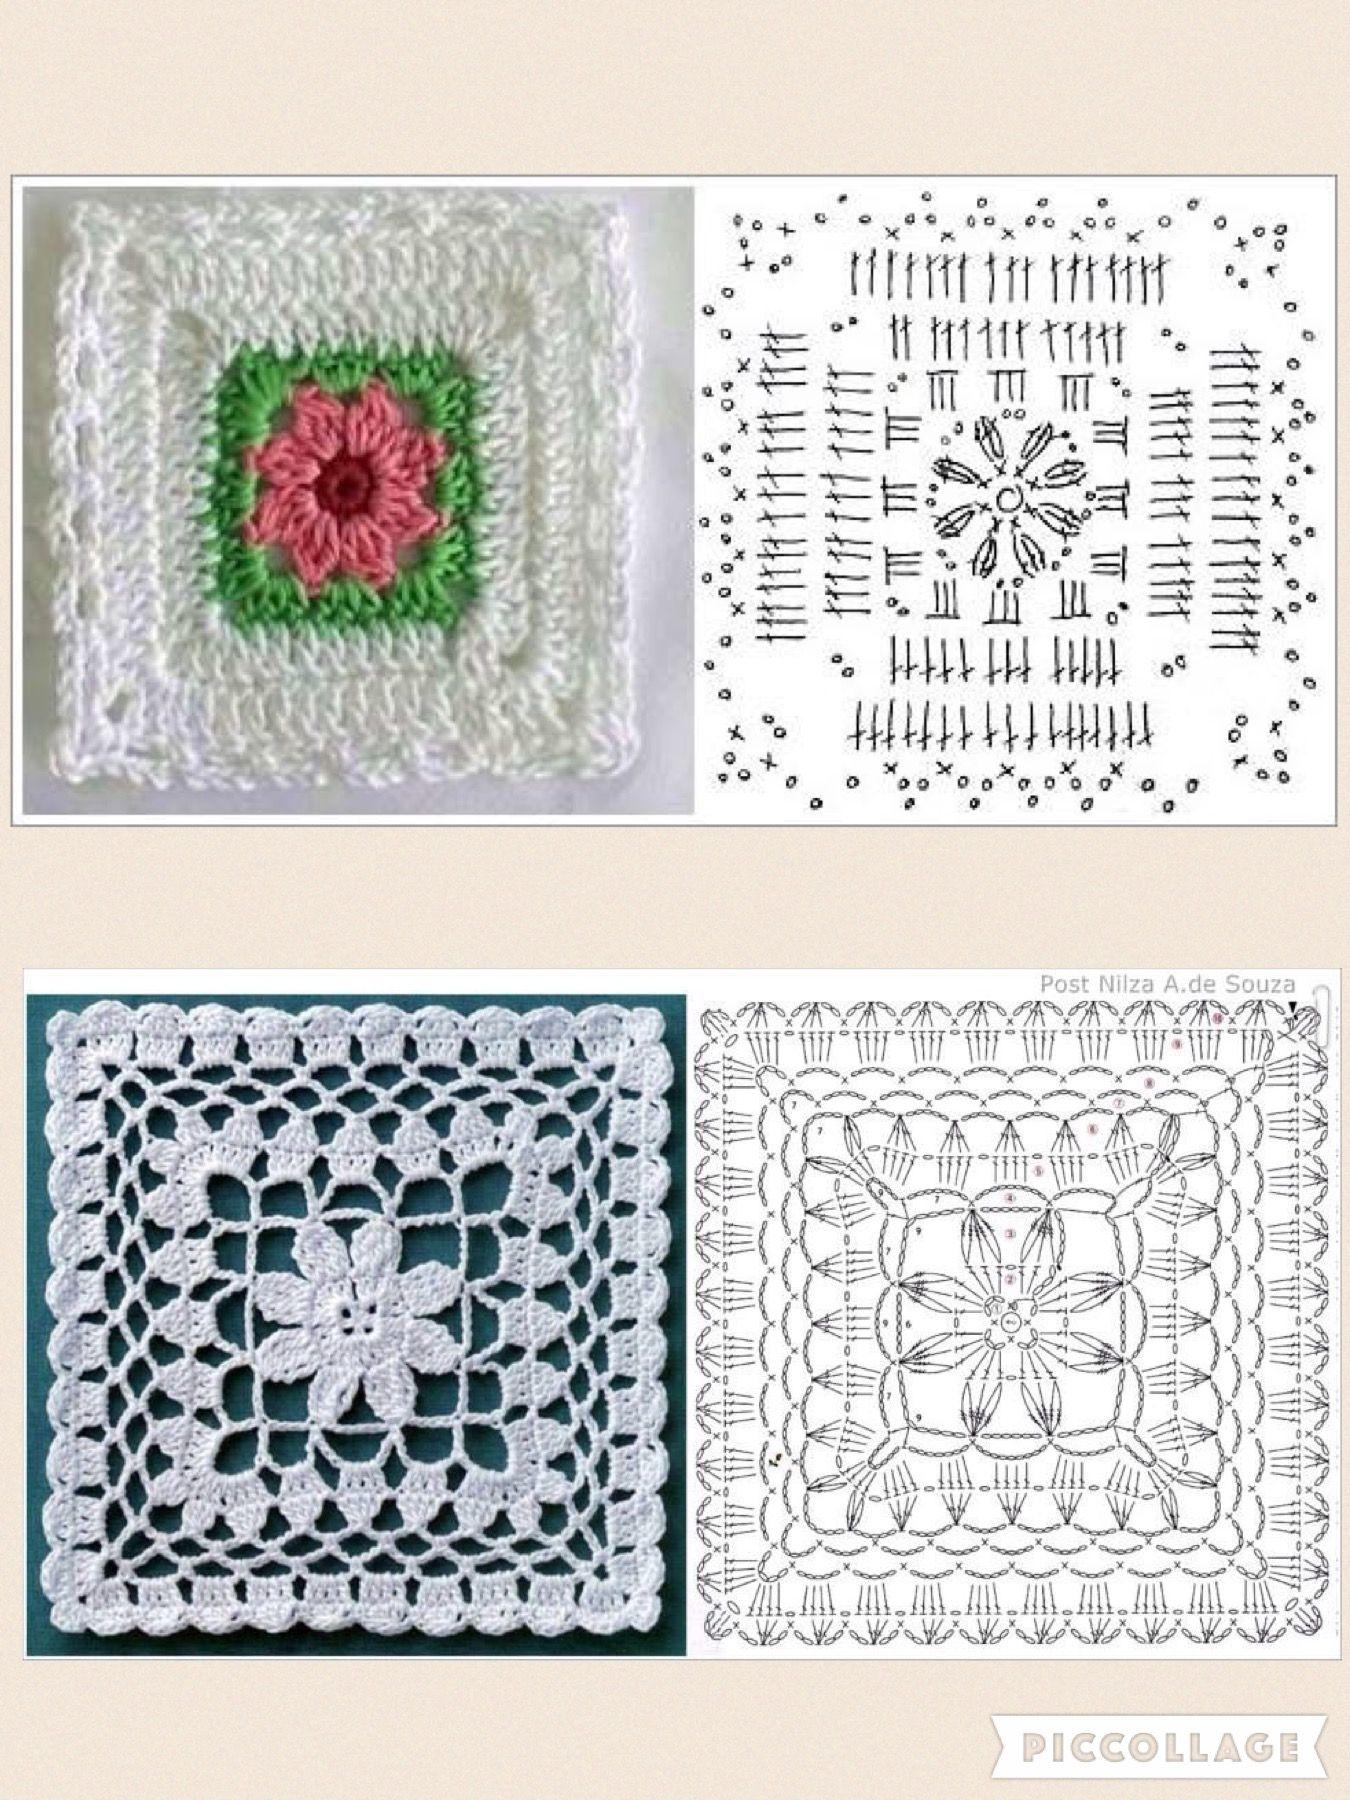 Pin de Yamila Elisabet en patrones crochet | Pinterest | Almohadones ...